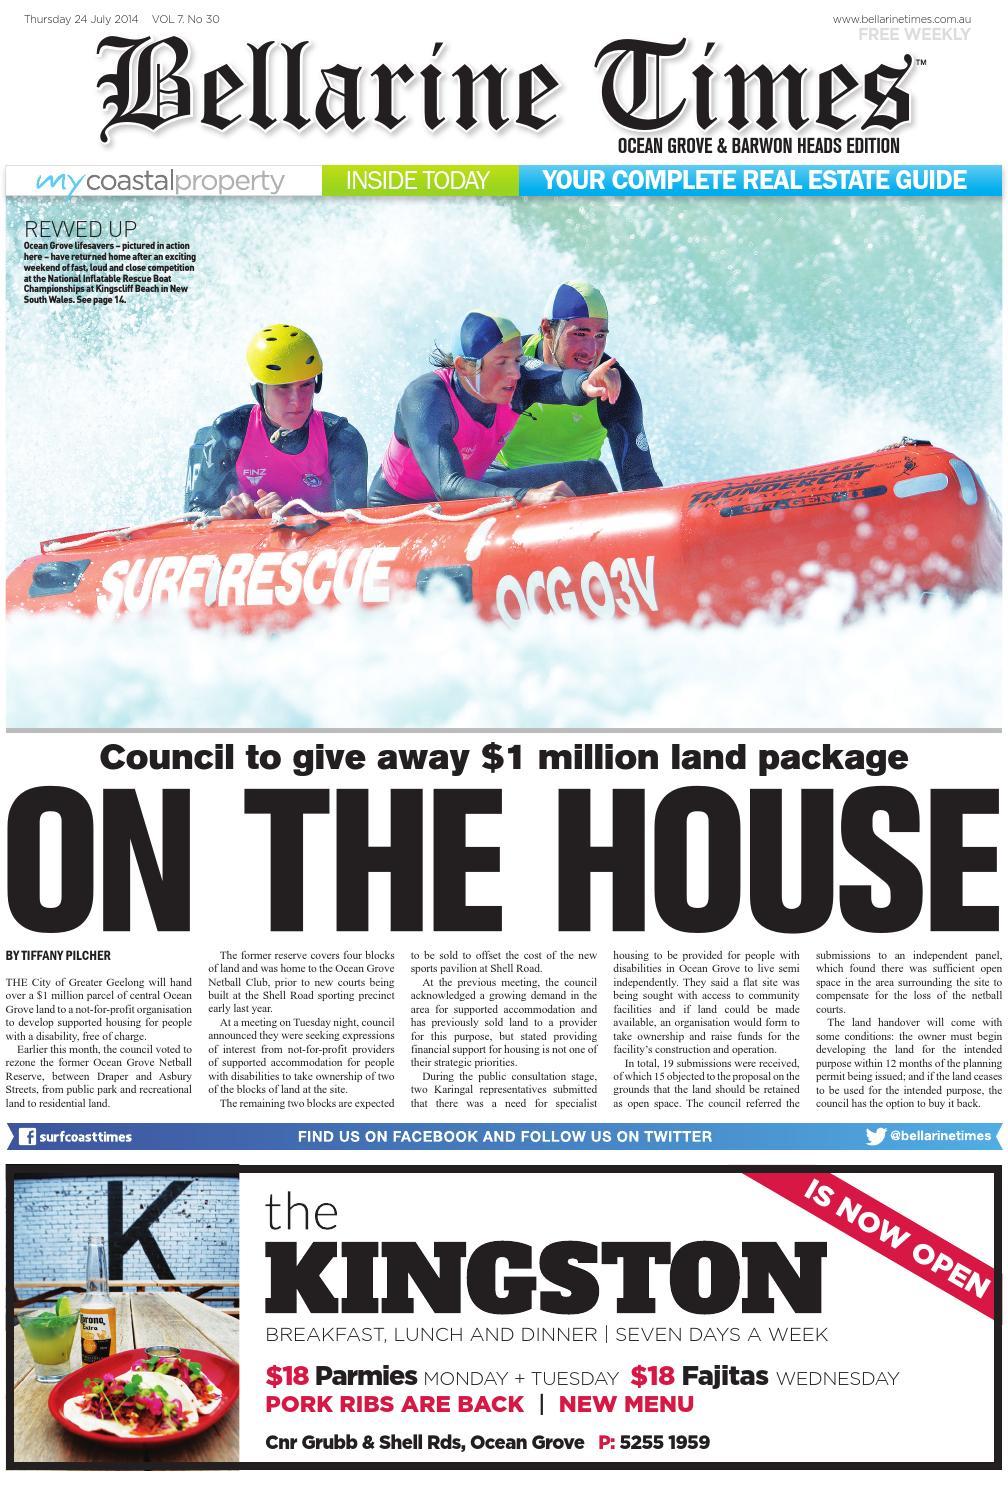 Bellarine Times Ocean Grove: July 24, 2014 by Surf Coast News ...